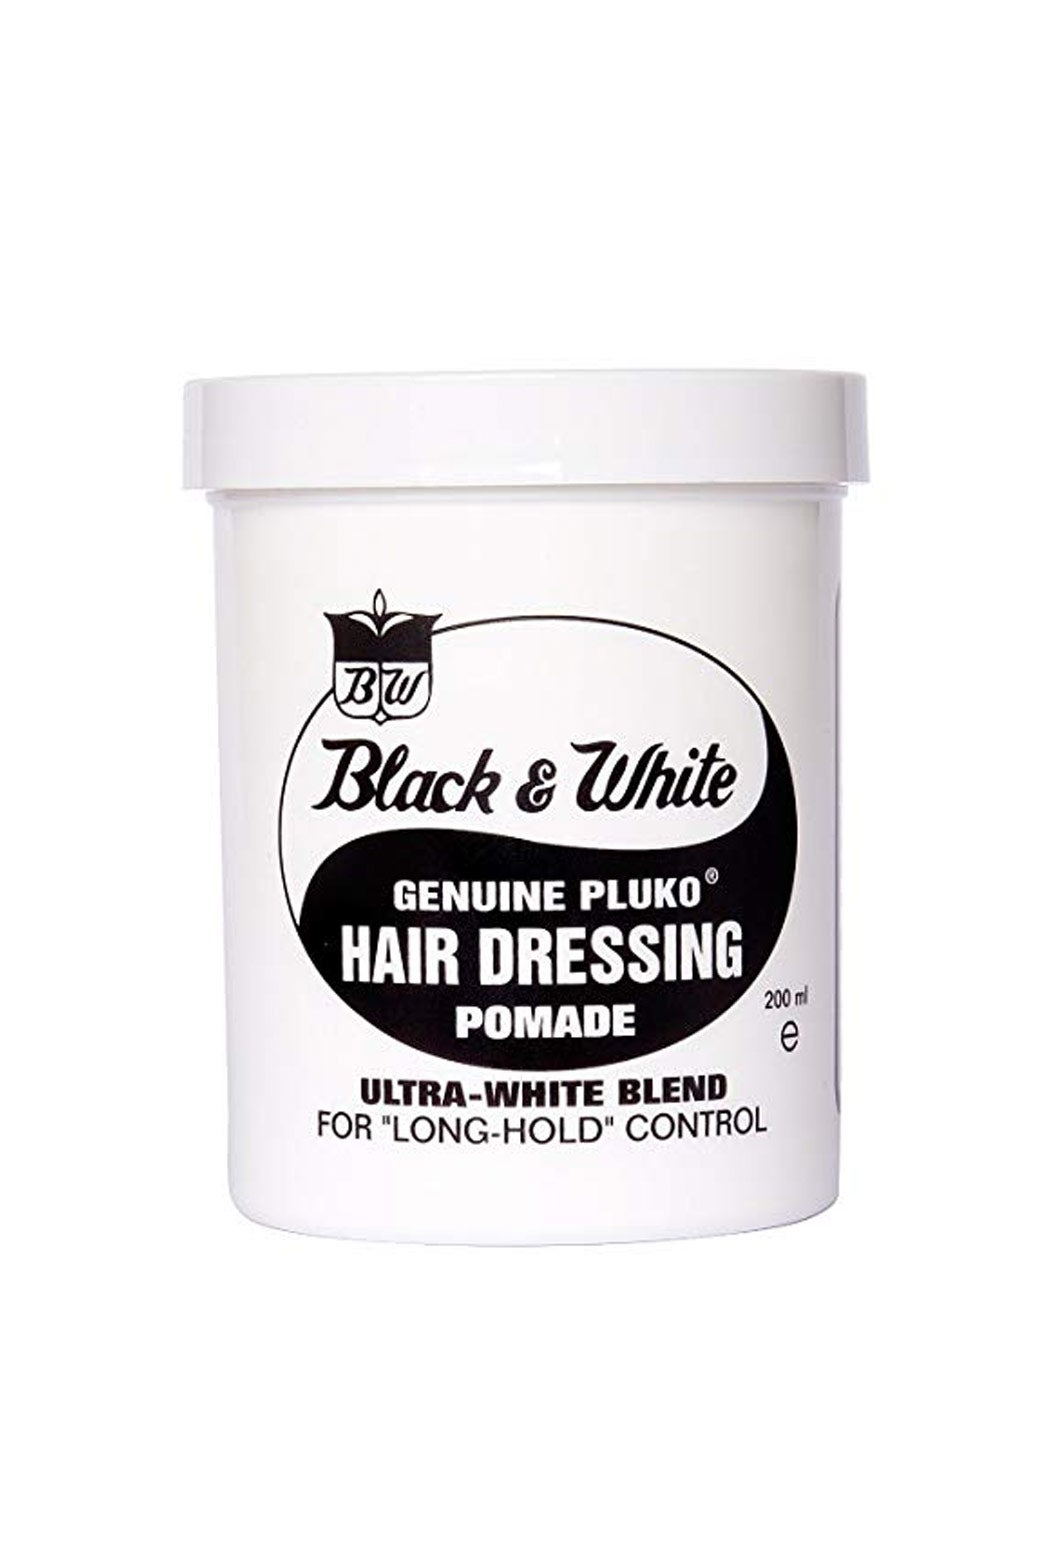 Black and White pomade.